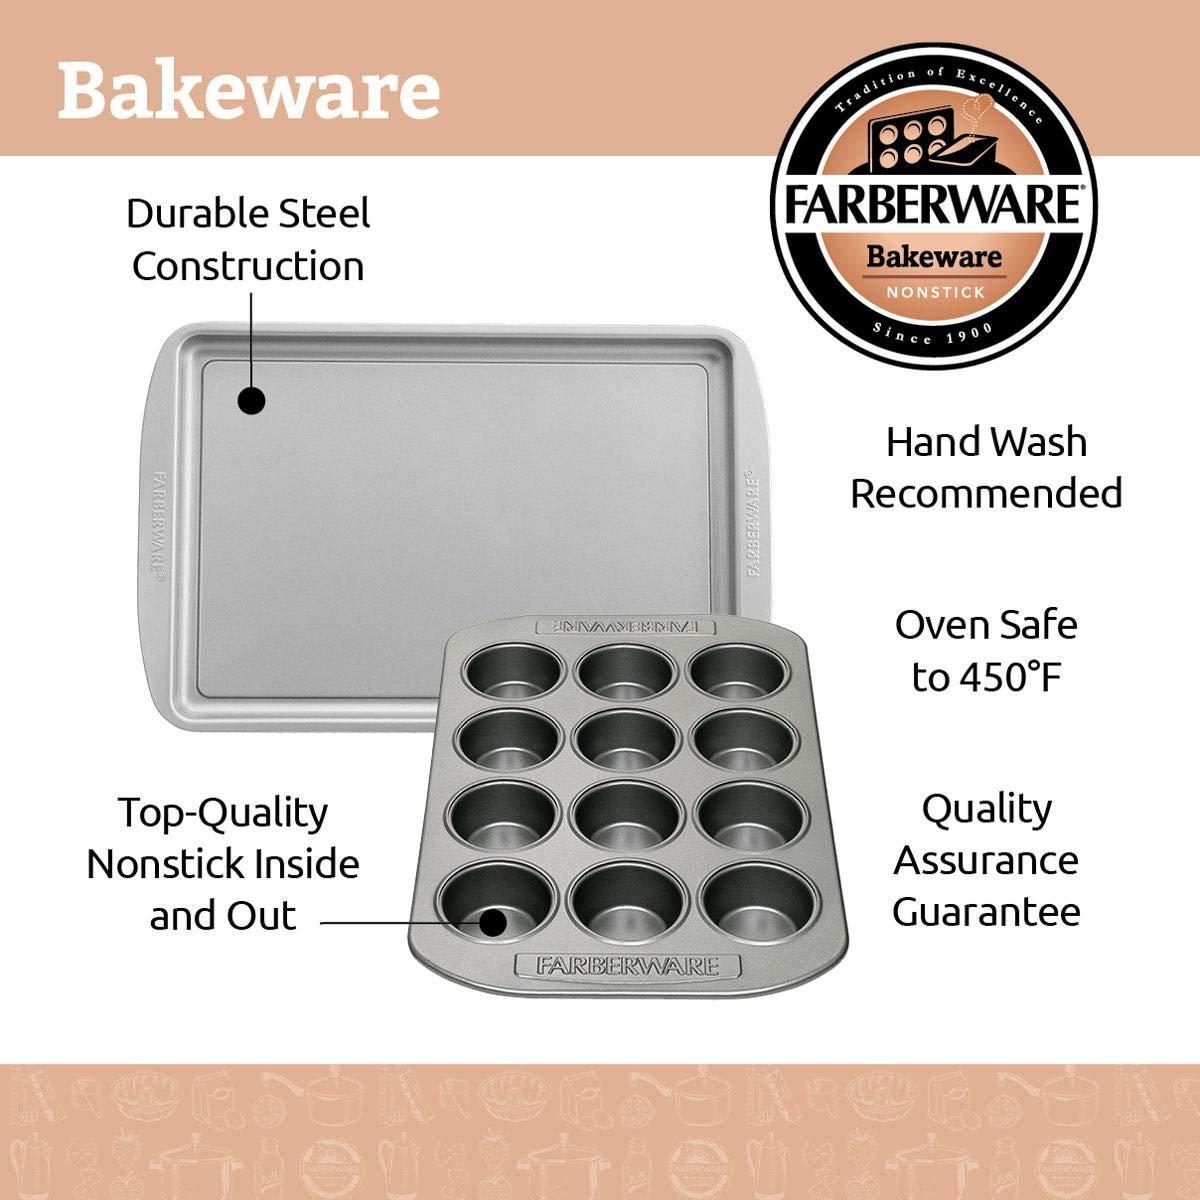 Farberware 47744 2-Piece Rectangular Set Steel Cake Pan, Gray by Farberware (Image #4)